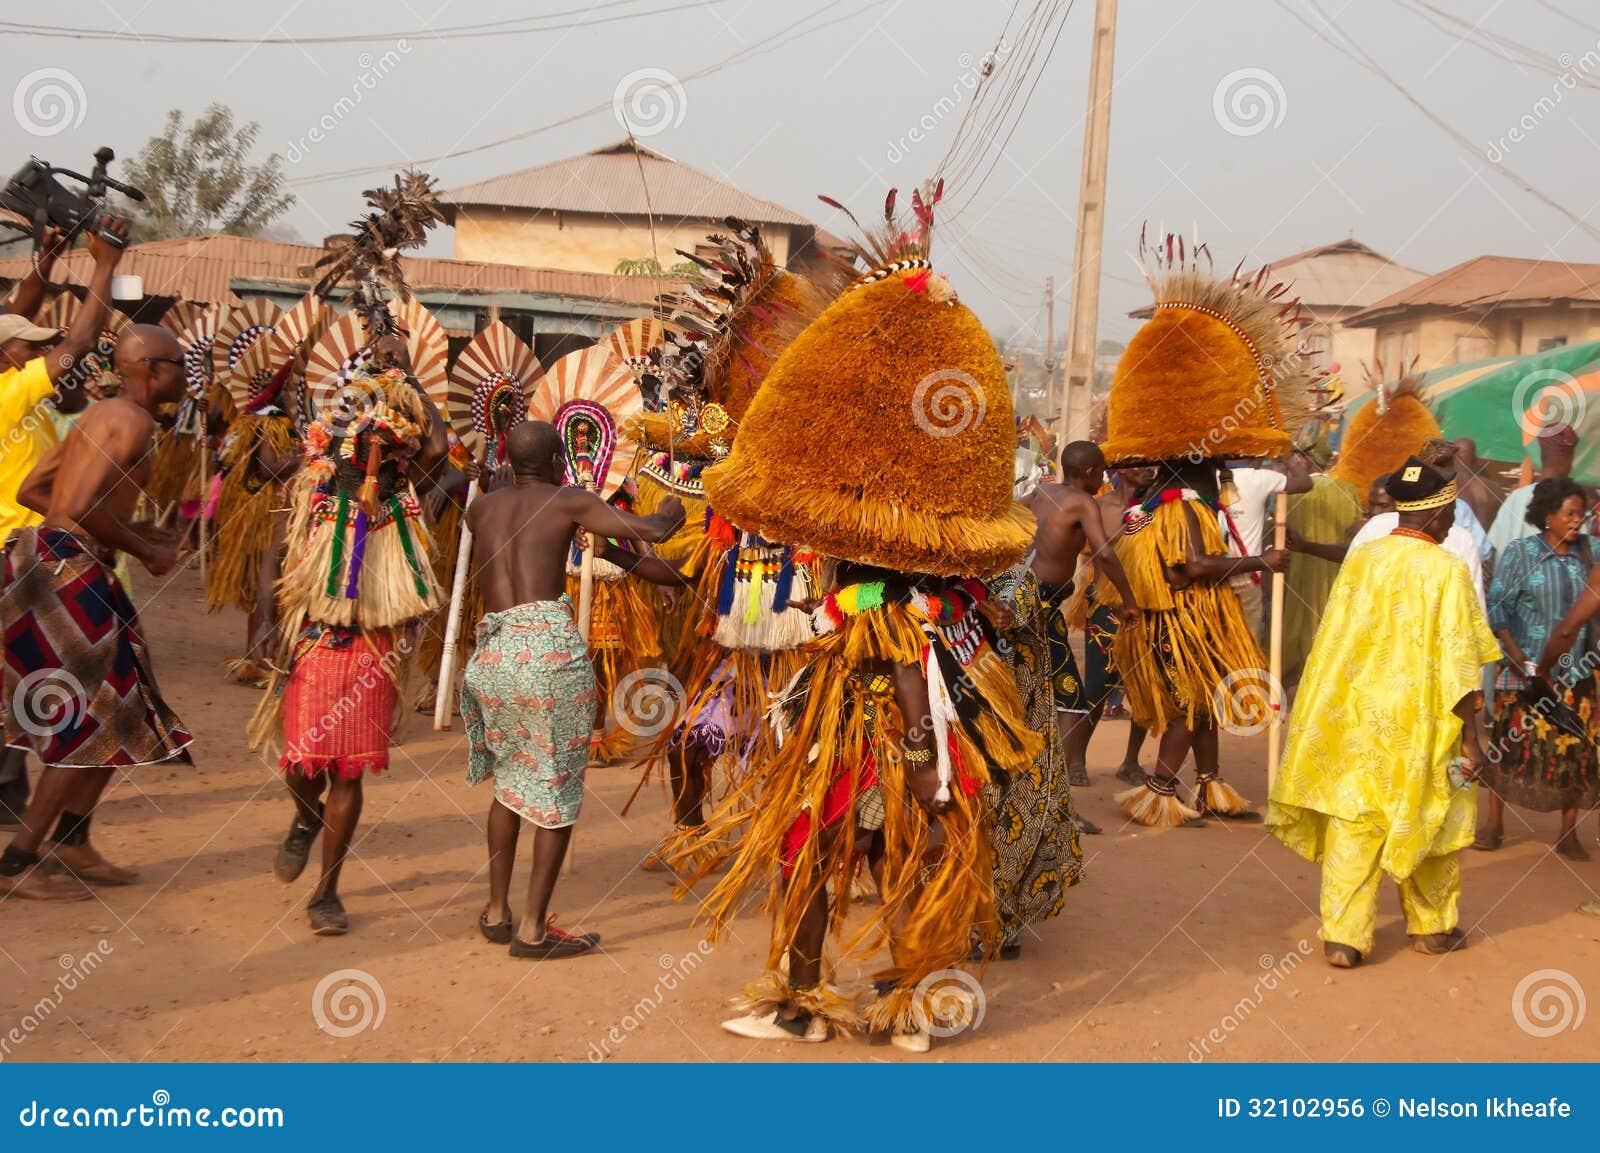 Het Festival van Otuoukpesose - Itu Maskerade in Nigeria